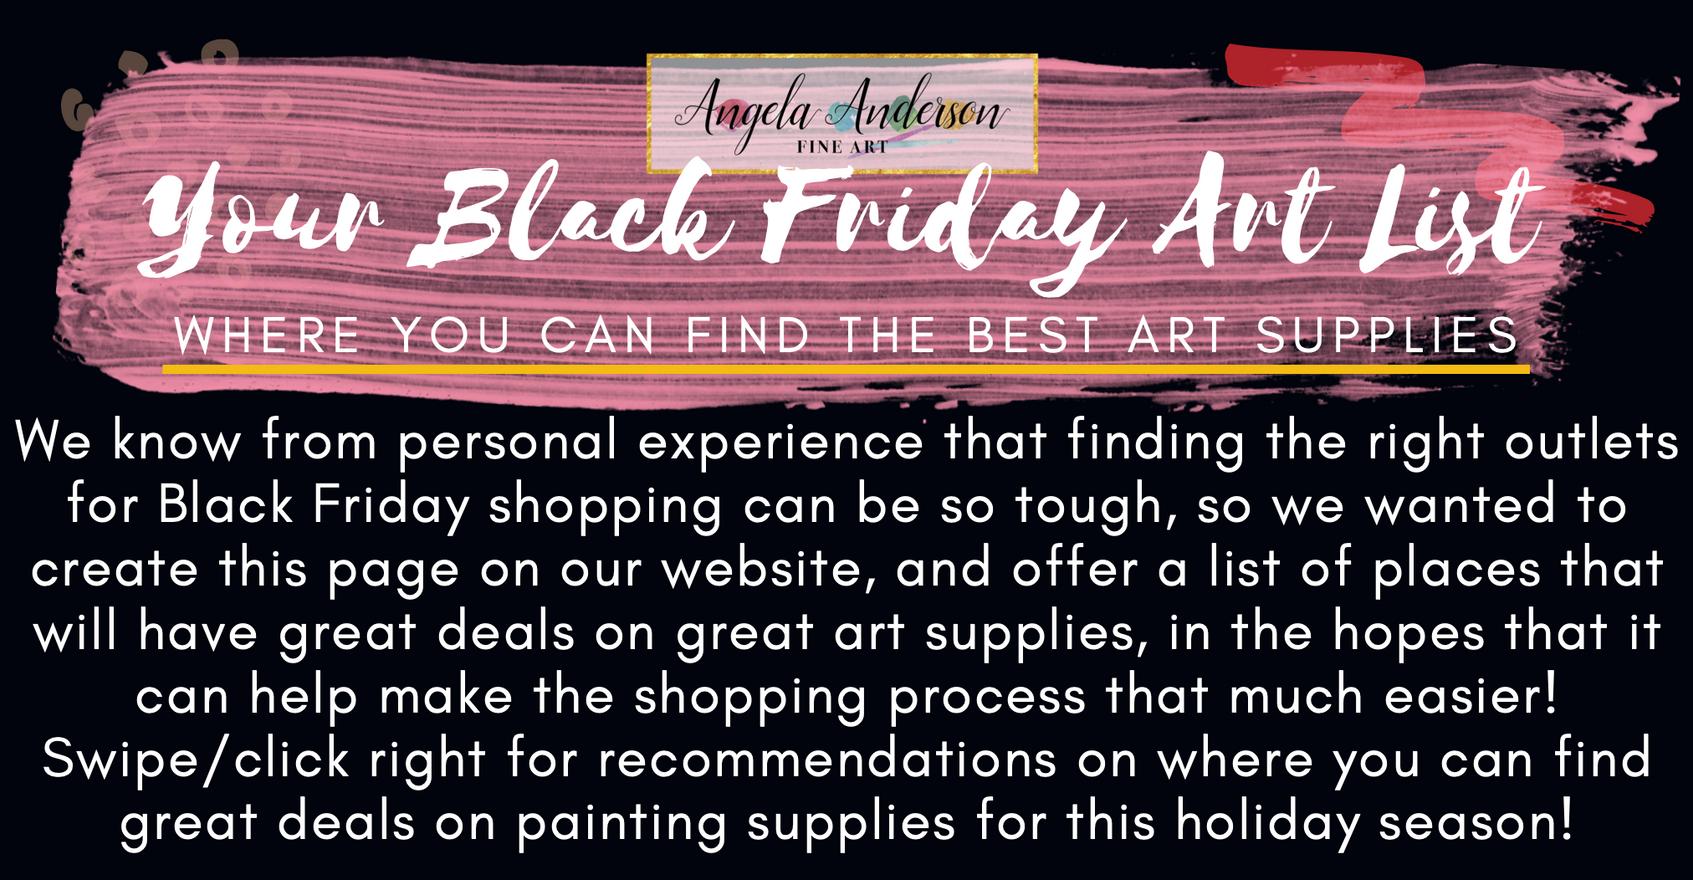 Black Friday Art List Intro